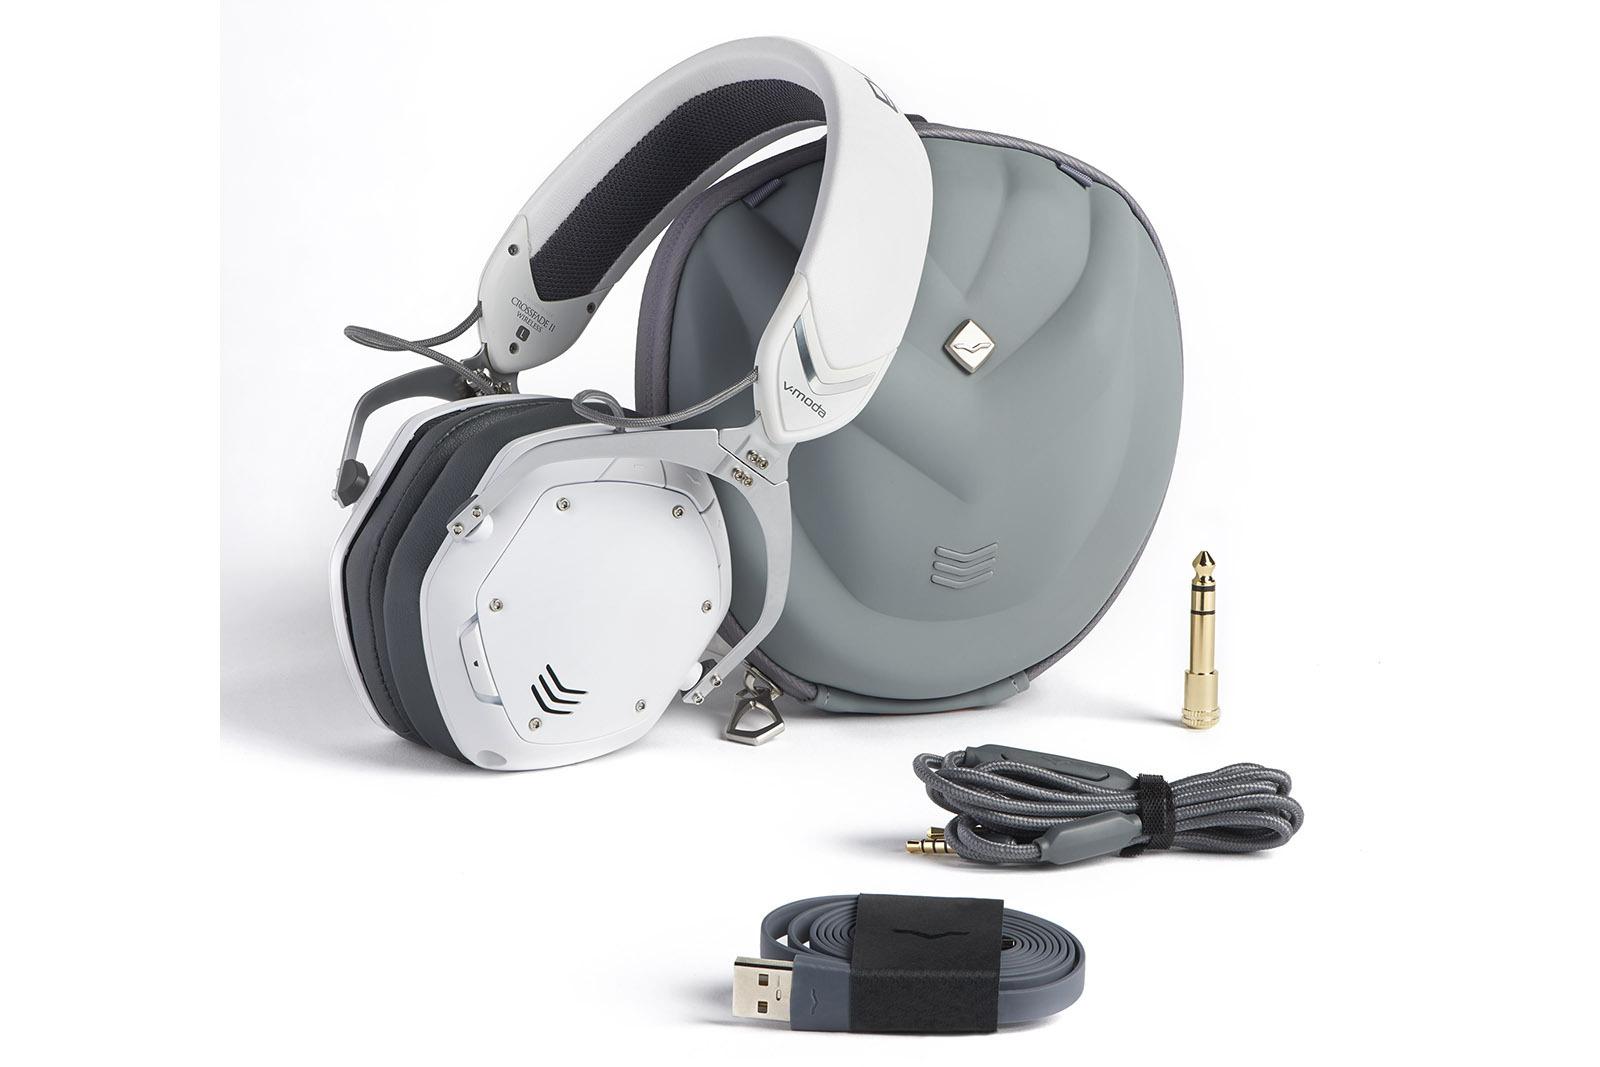 V MODA Crossfade 2 Wireless - Matte White